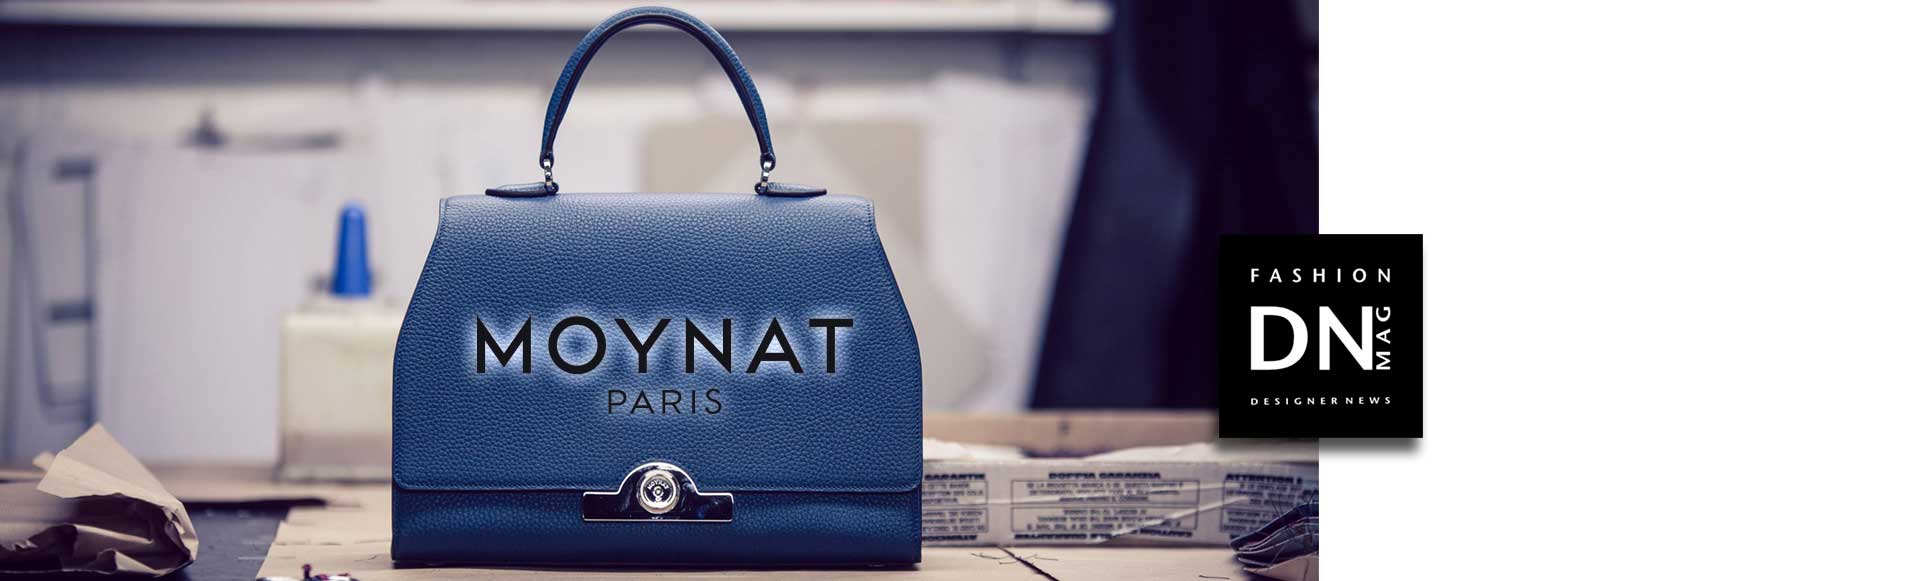 moynat-fashionweek-handbags-DNMAG